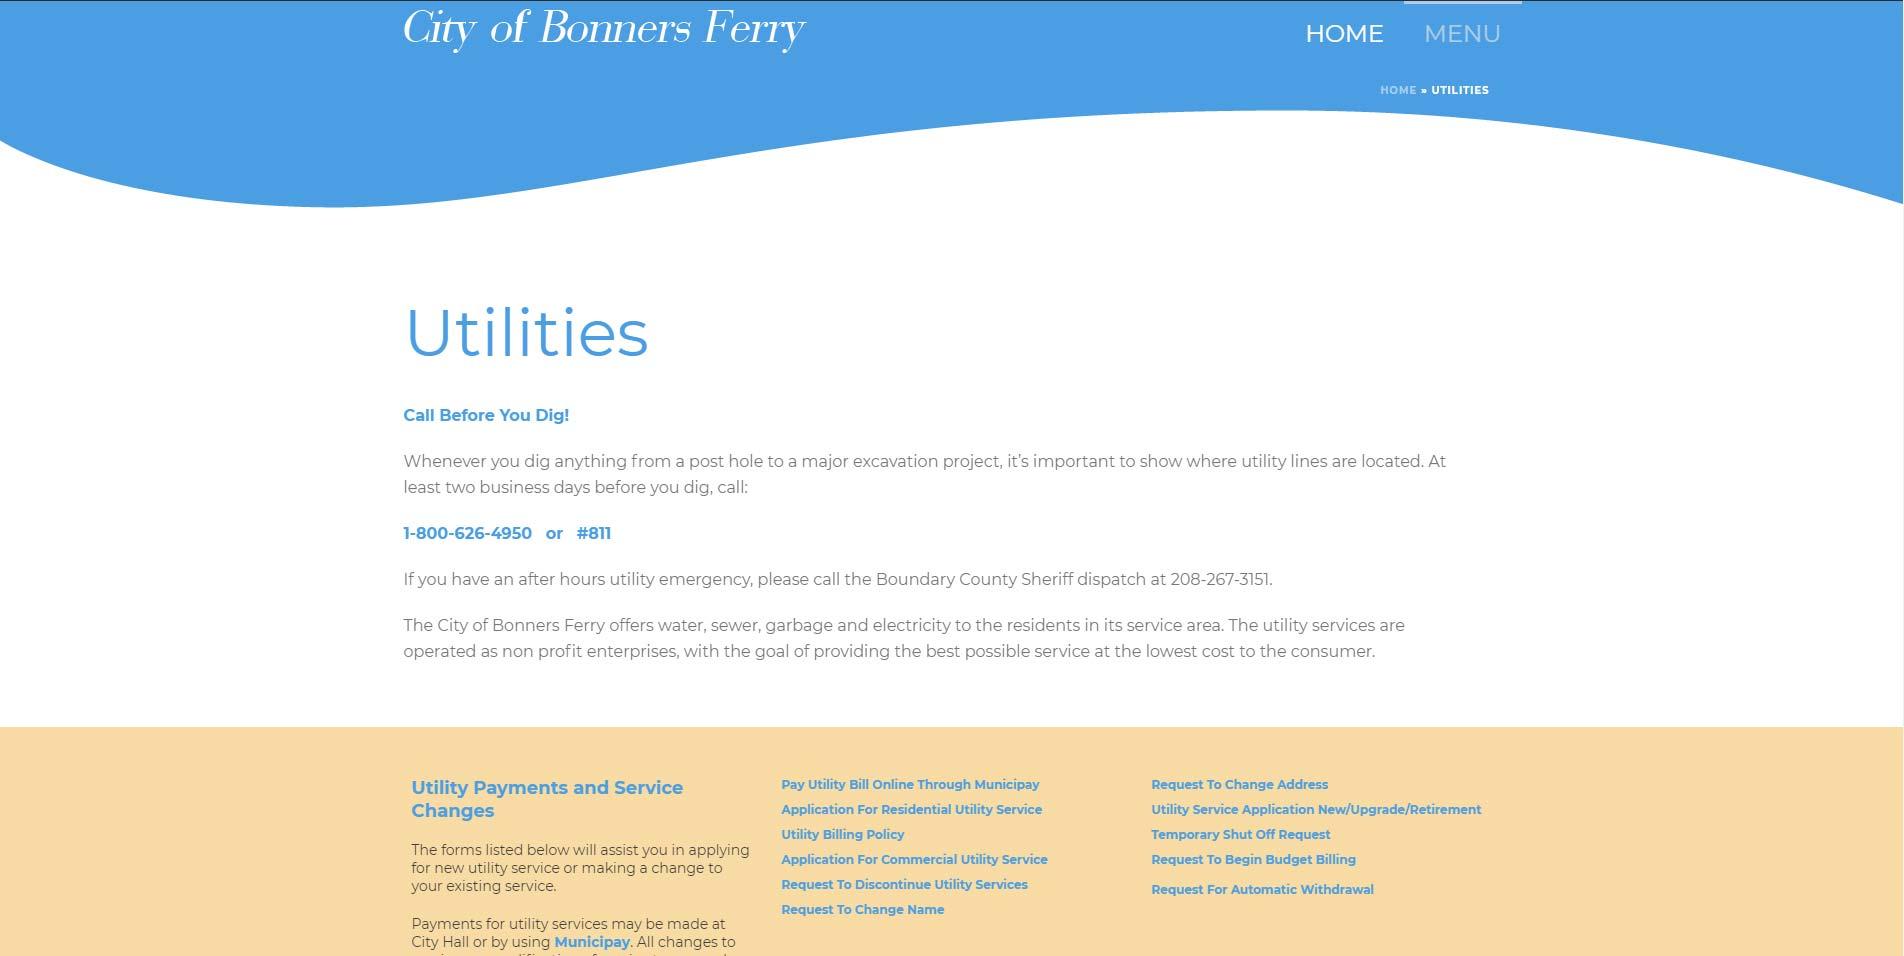 CBF_Utilities.jpg